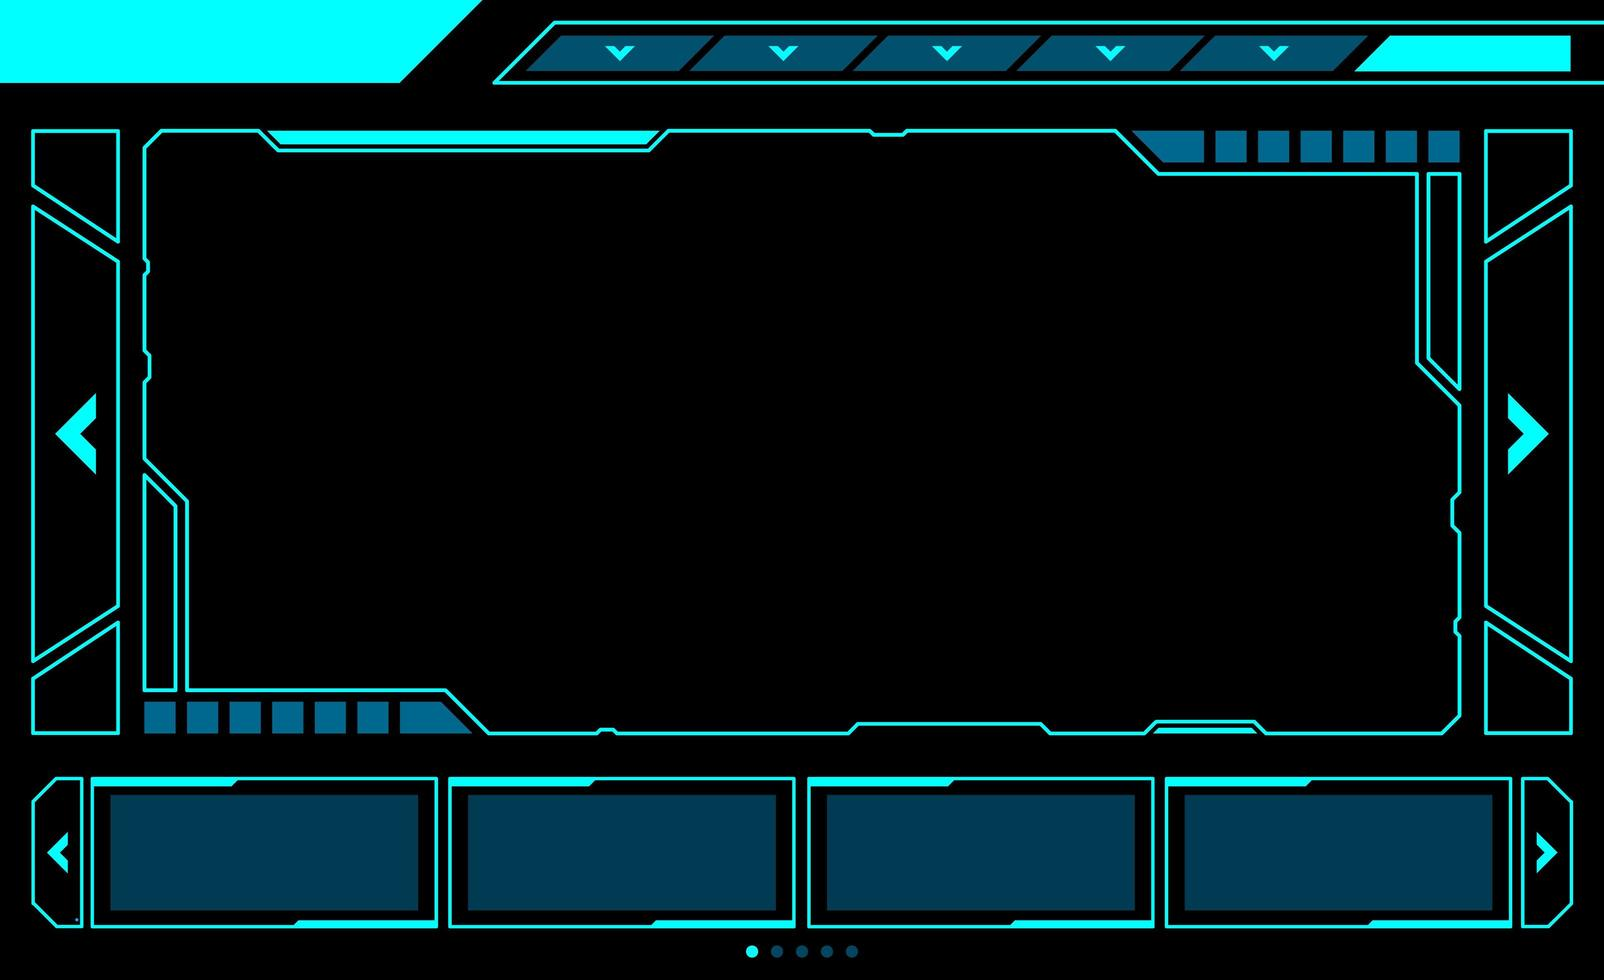 interface de hud de janela retangular grande vetor